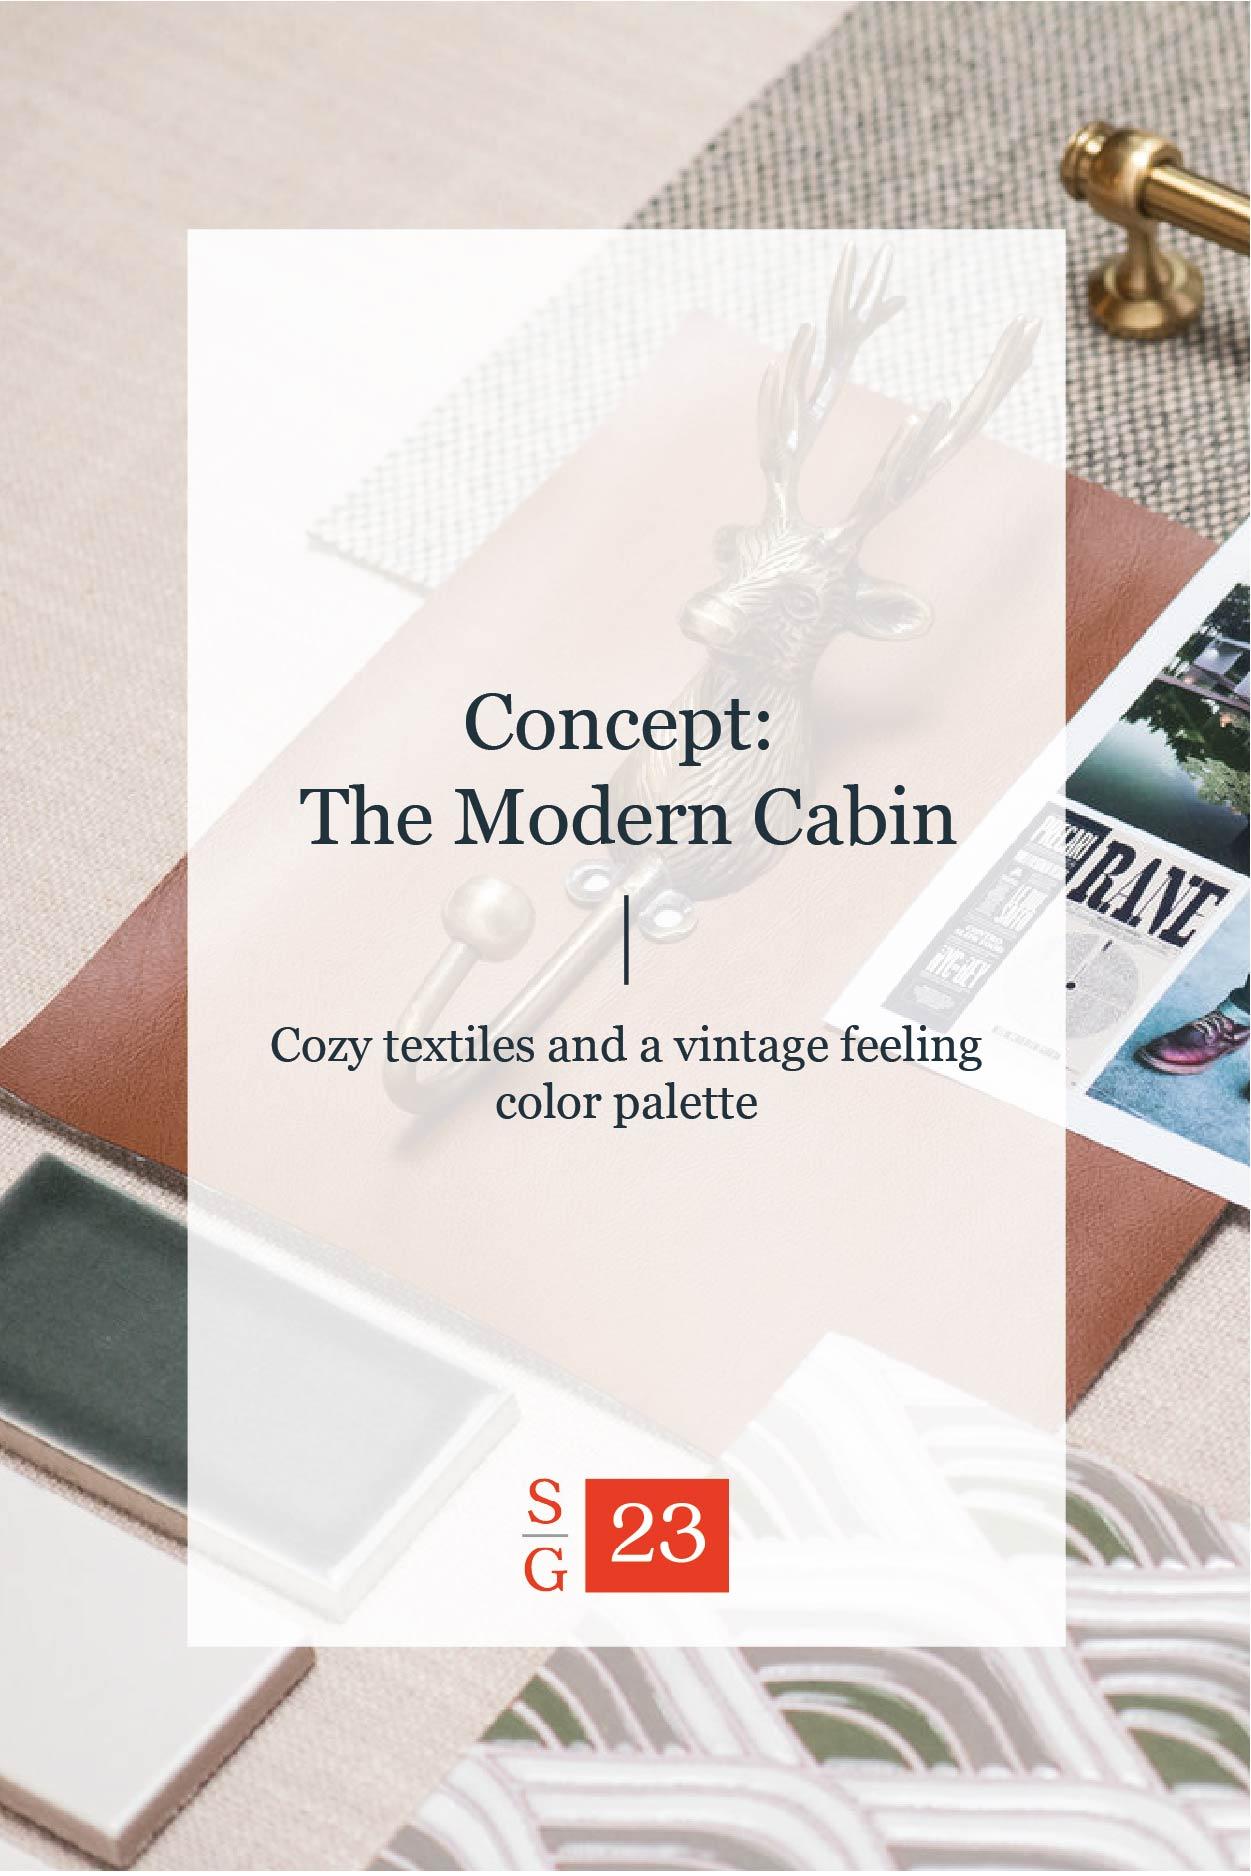 concept-modern-cabin-01.jpg